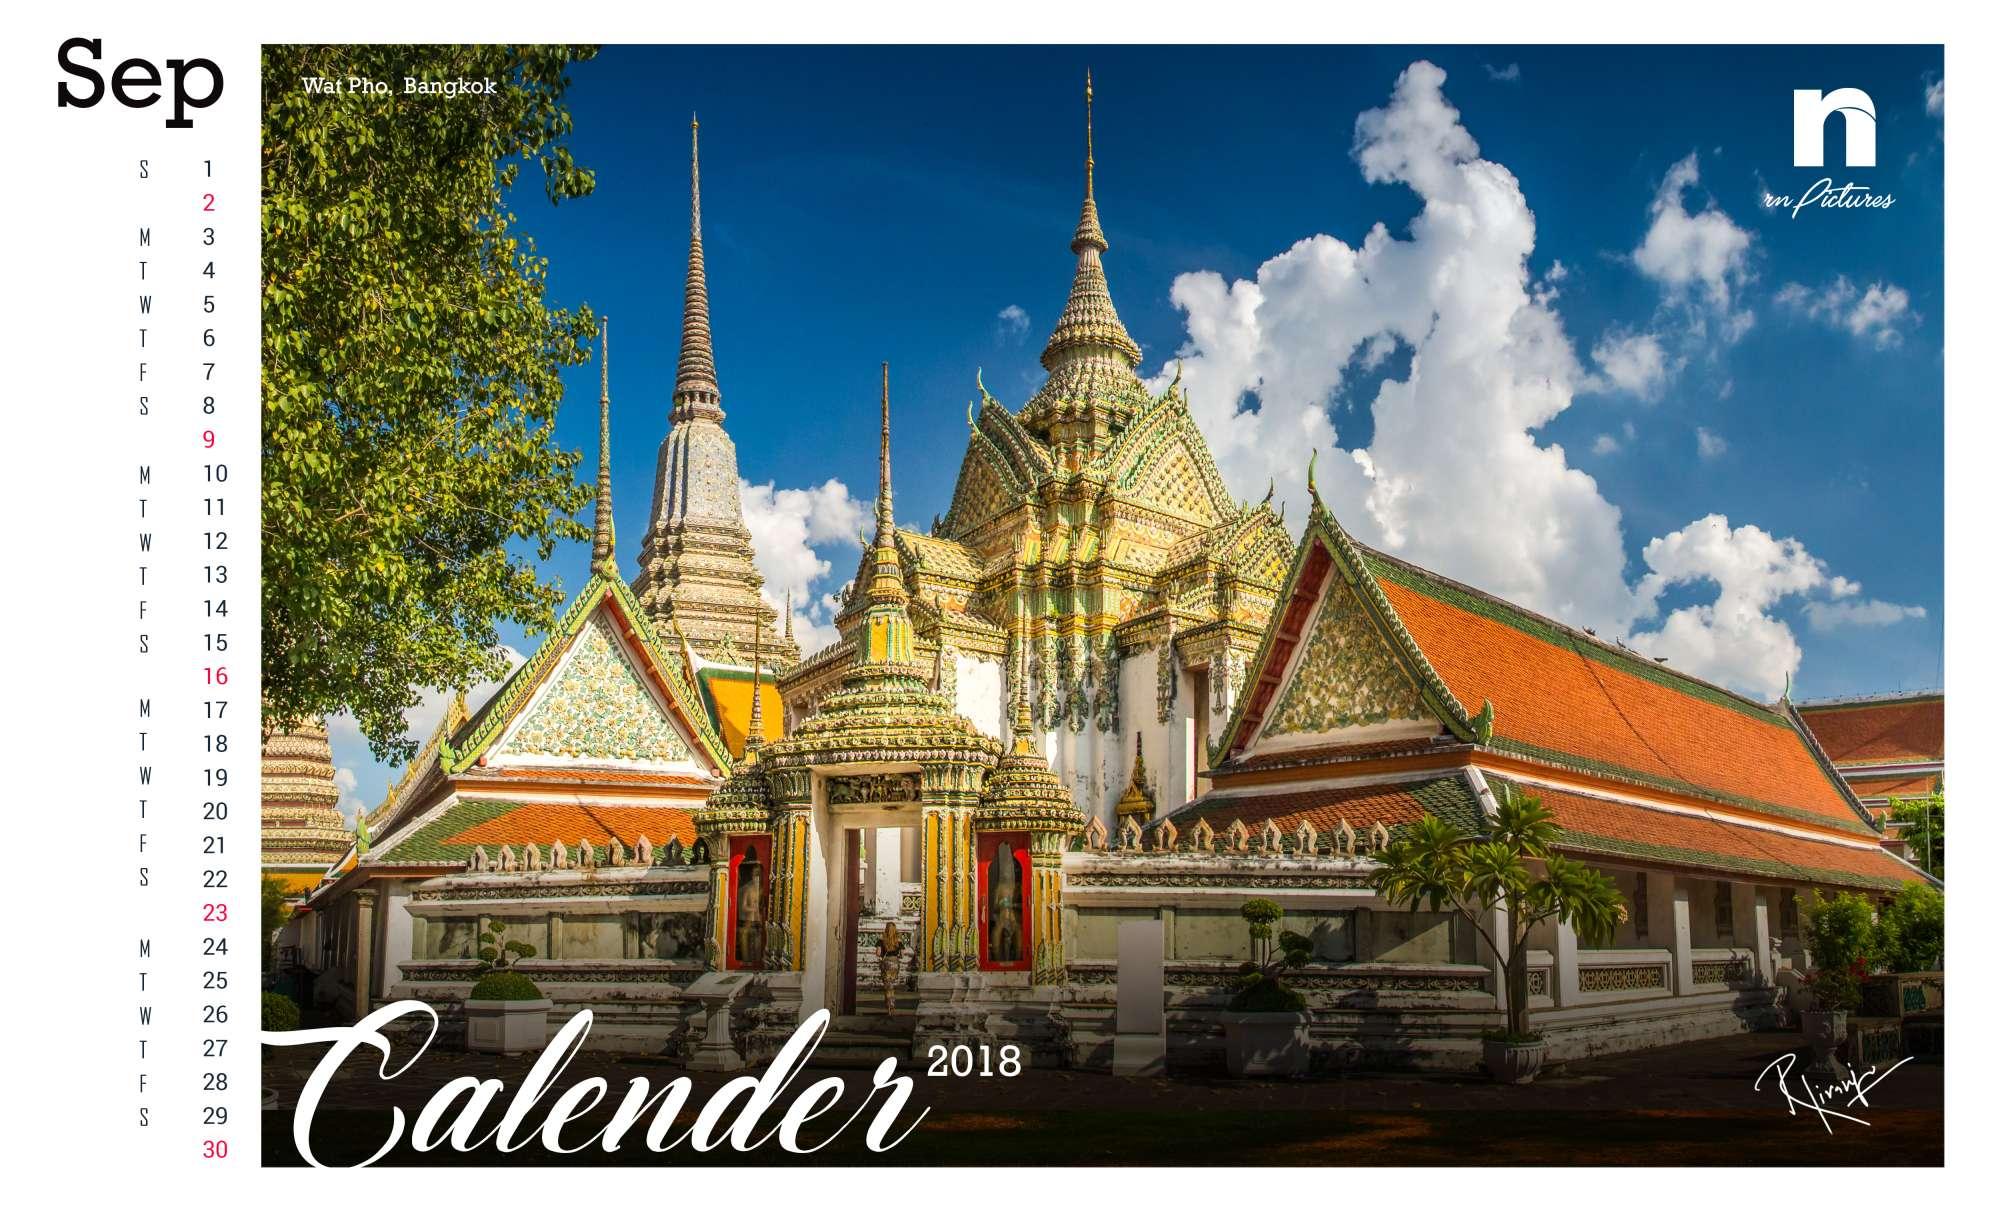 9-Sep_Calender-2018-rnPictures